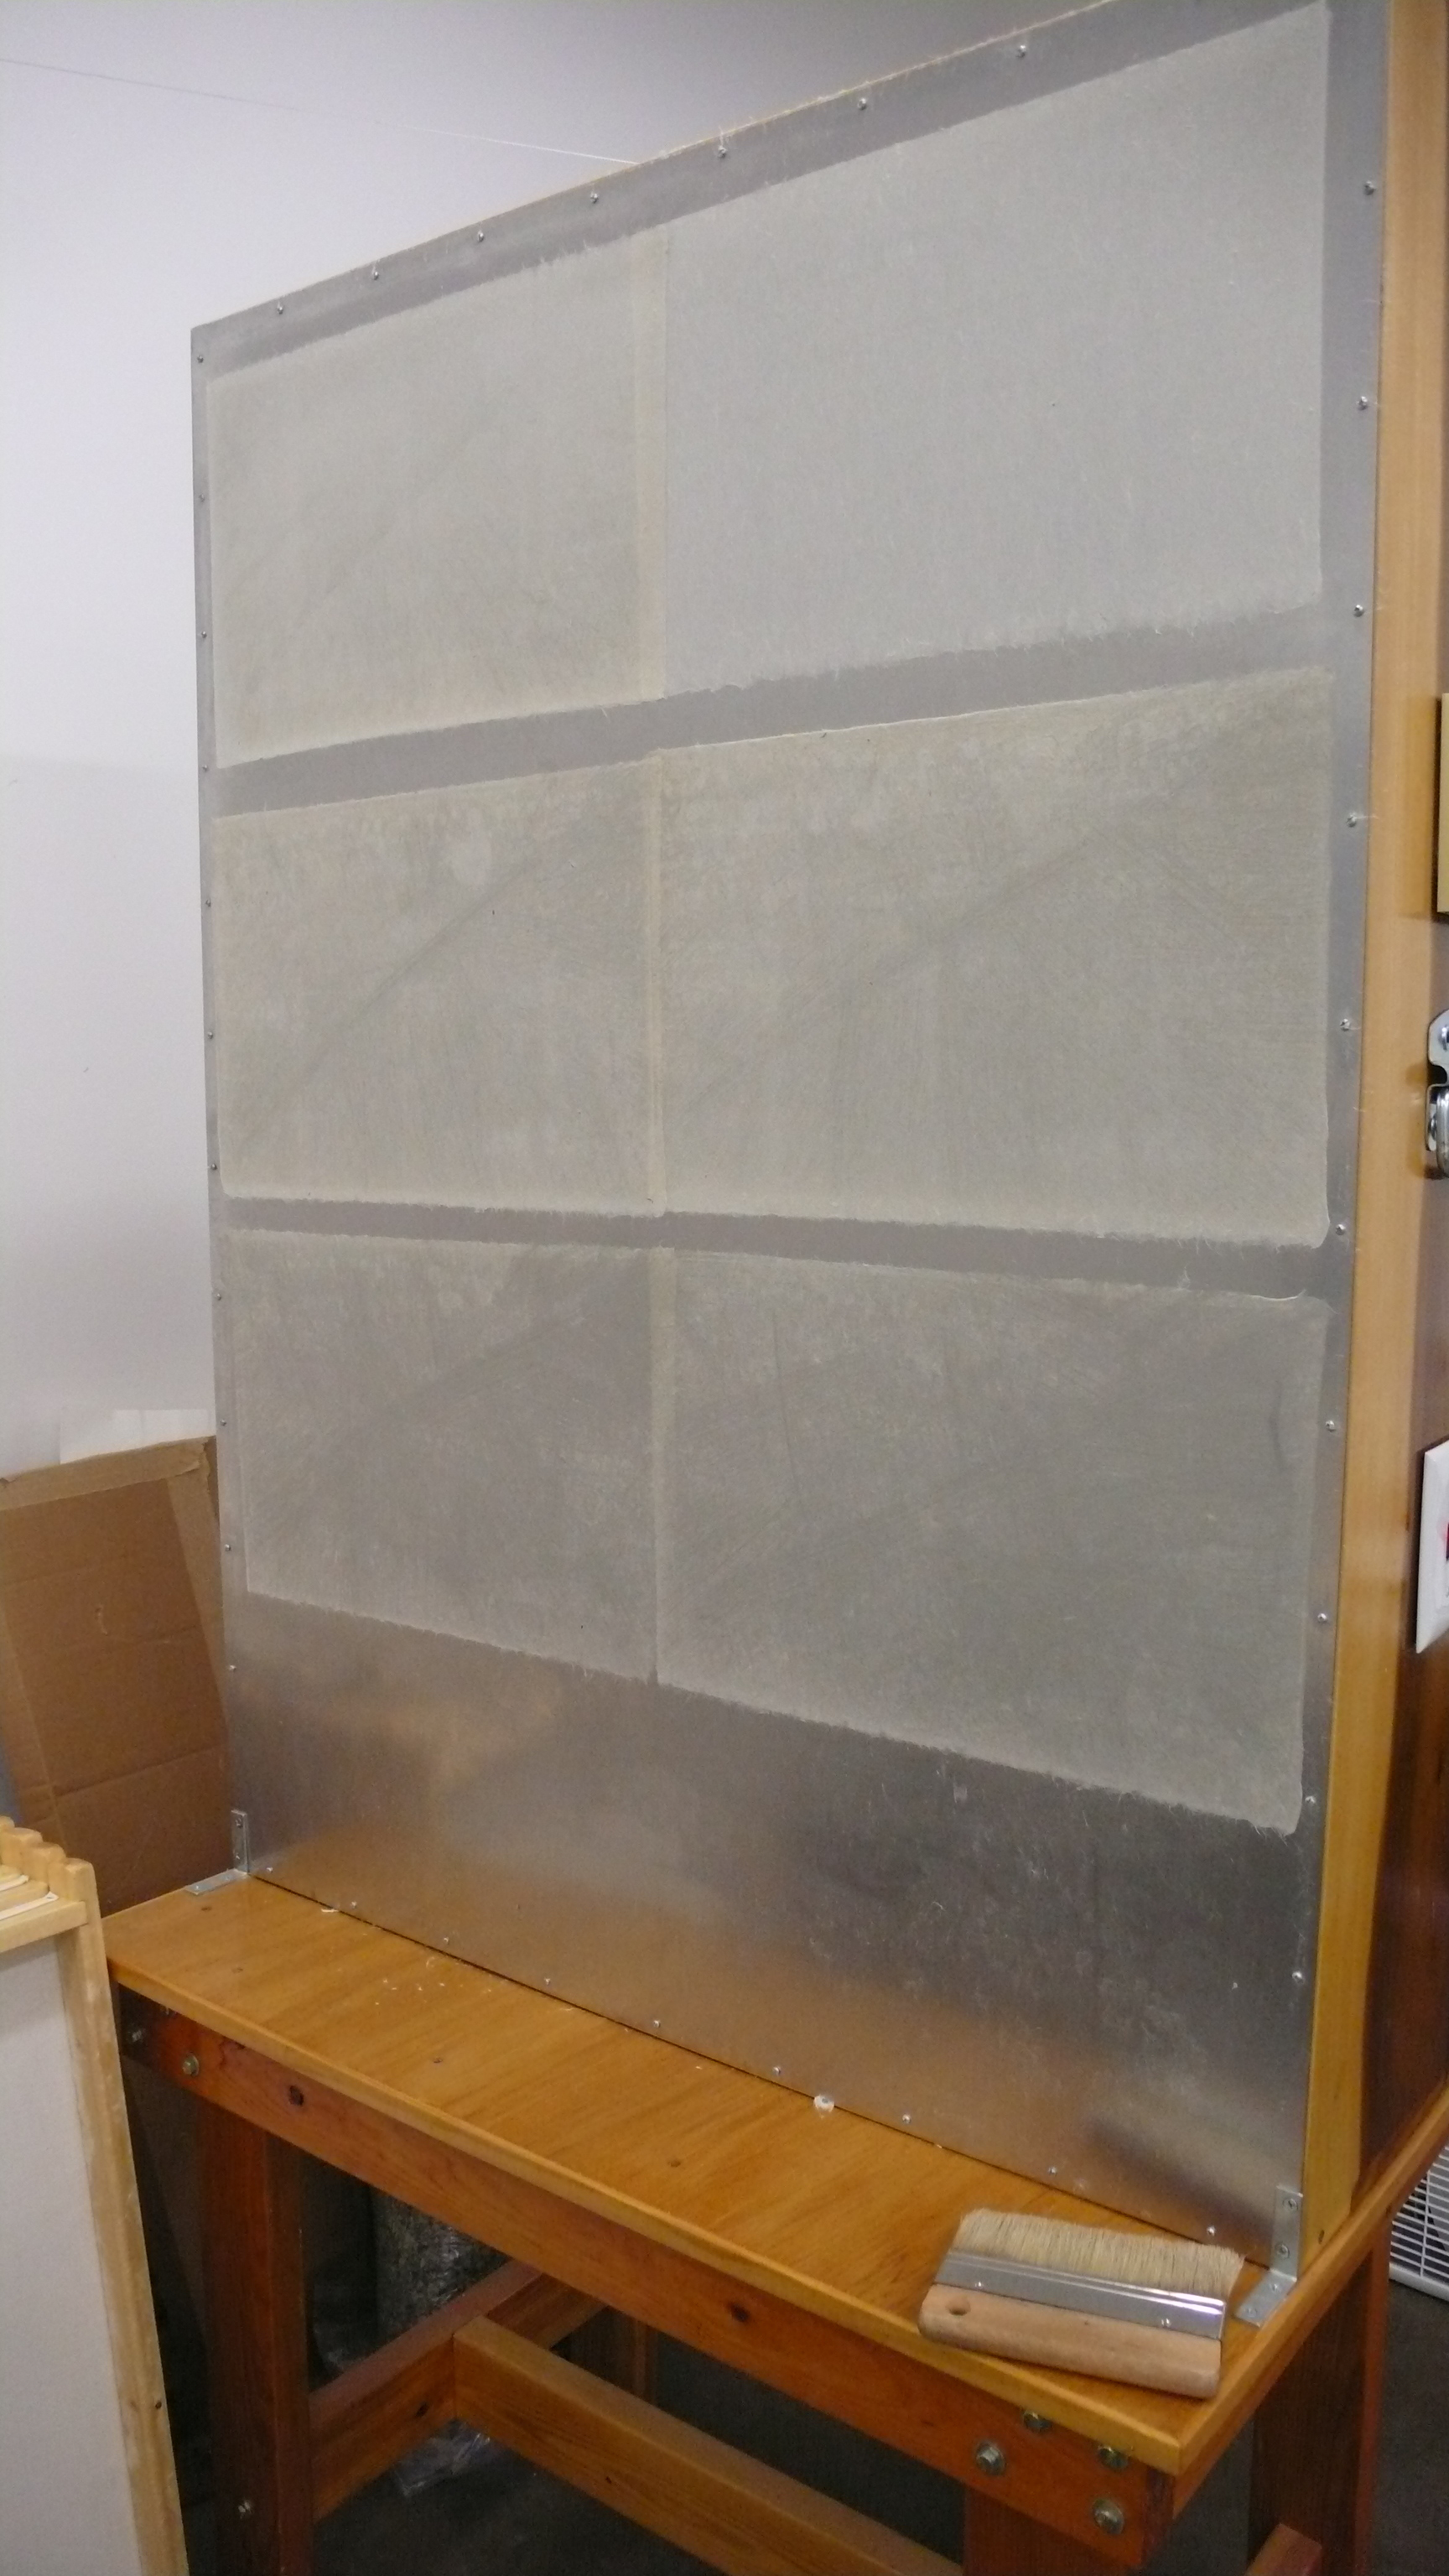 drying sheets